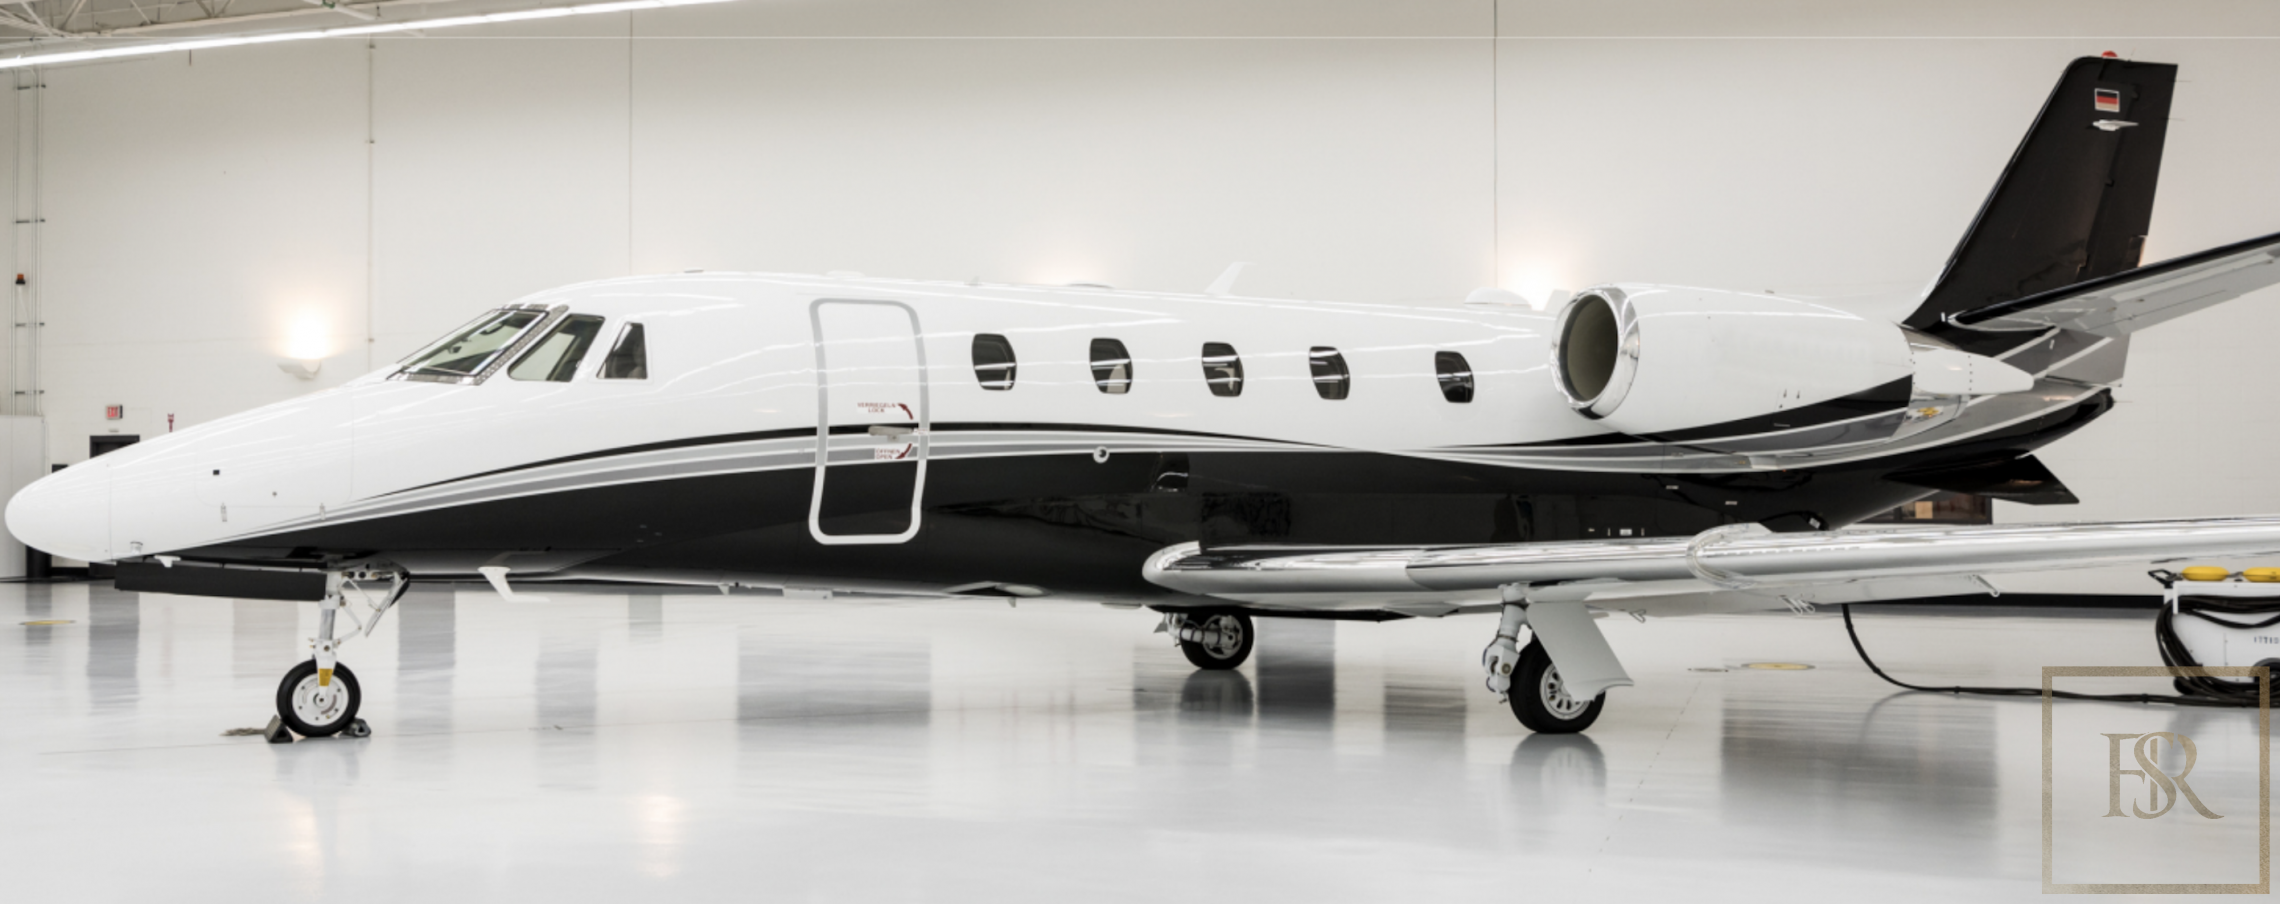 2012 CESSNA  charter rental For Super Rich